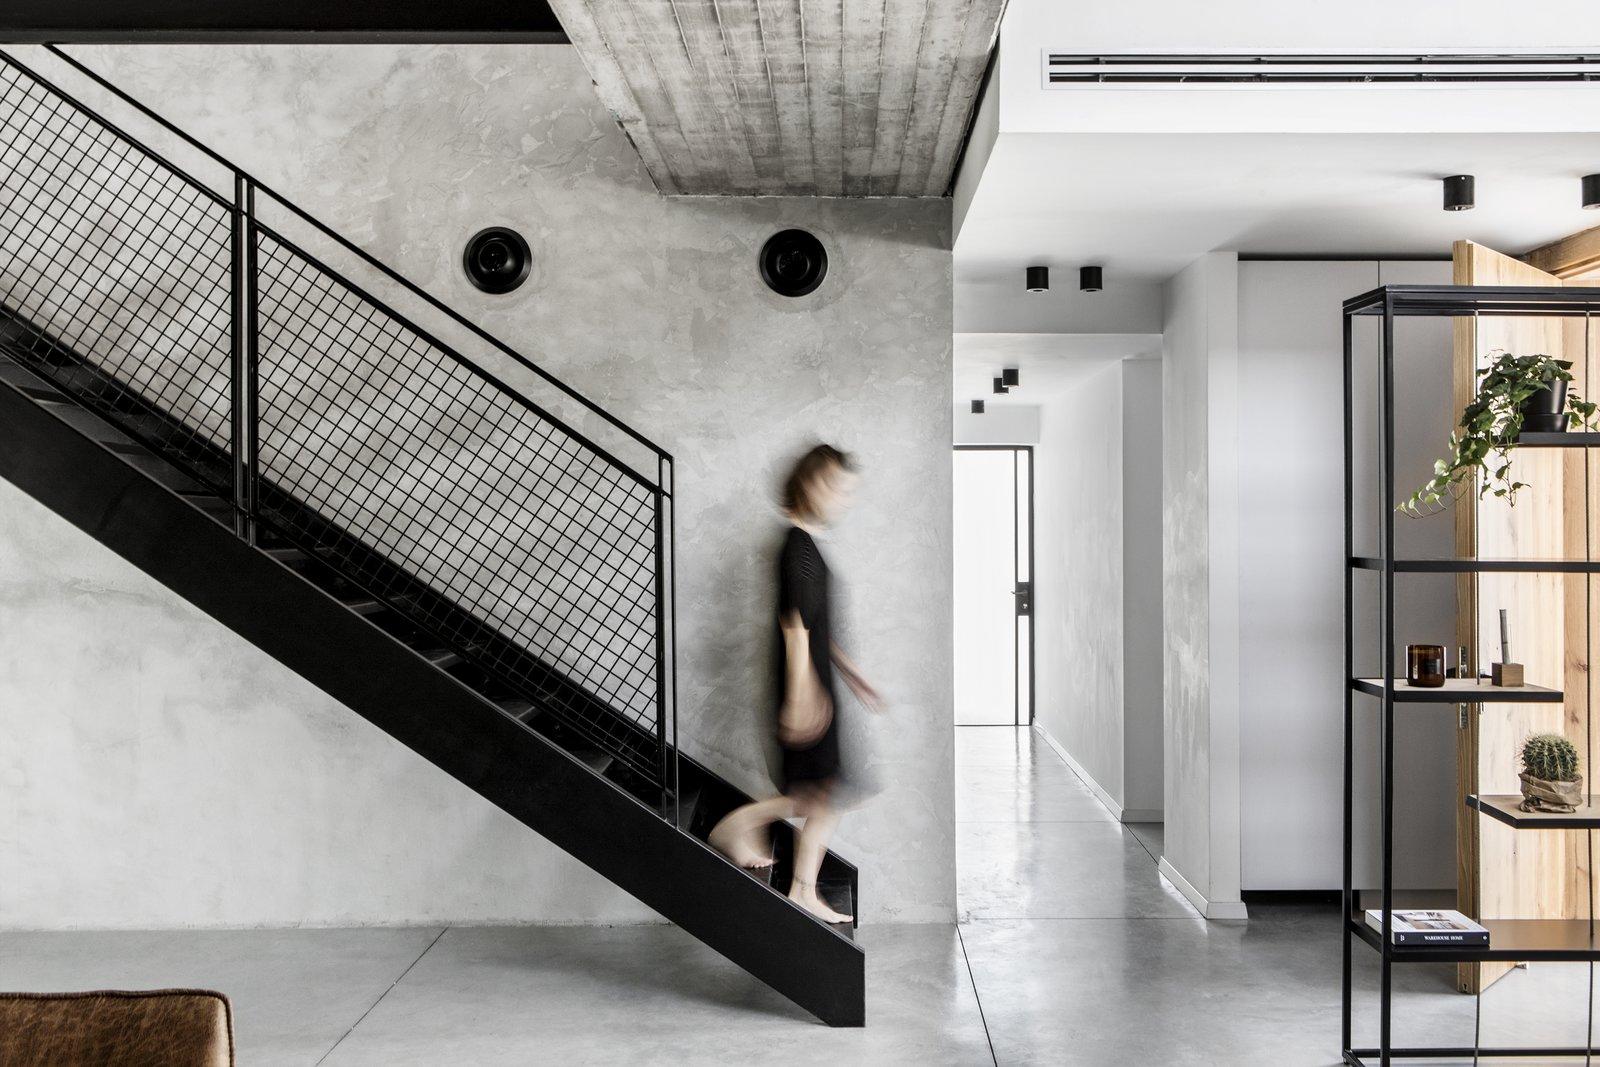 Hallway and Concrete Floor  Nir Am House by Shir Shtaigman